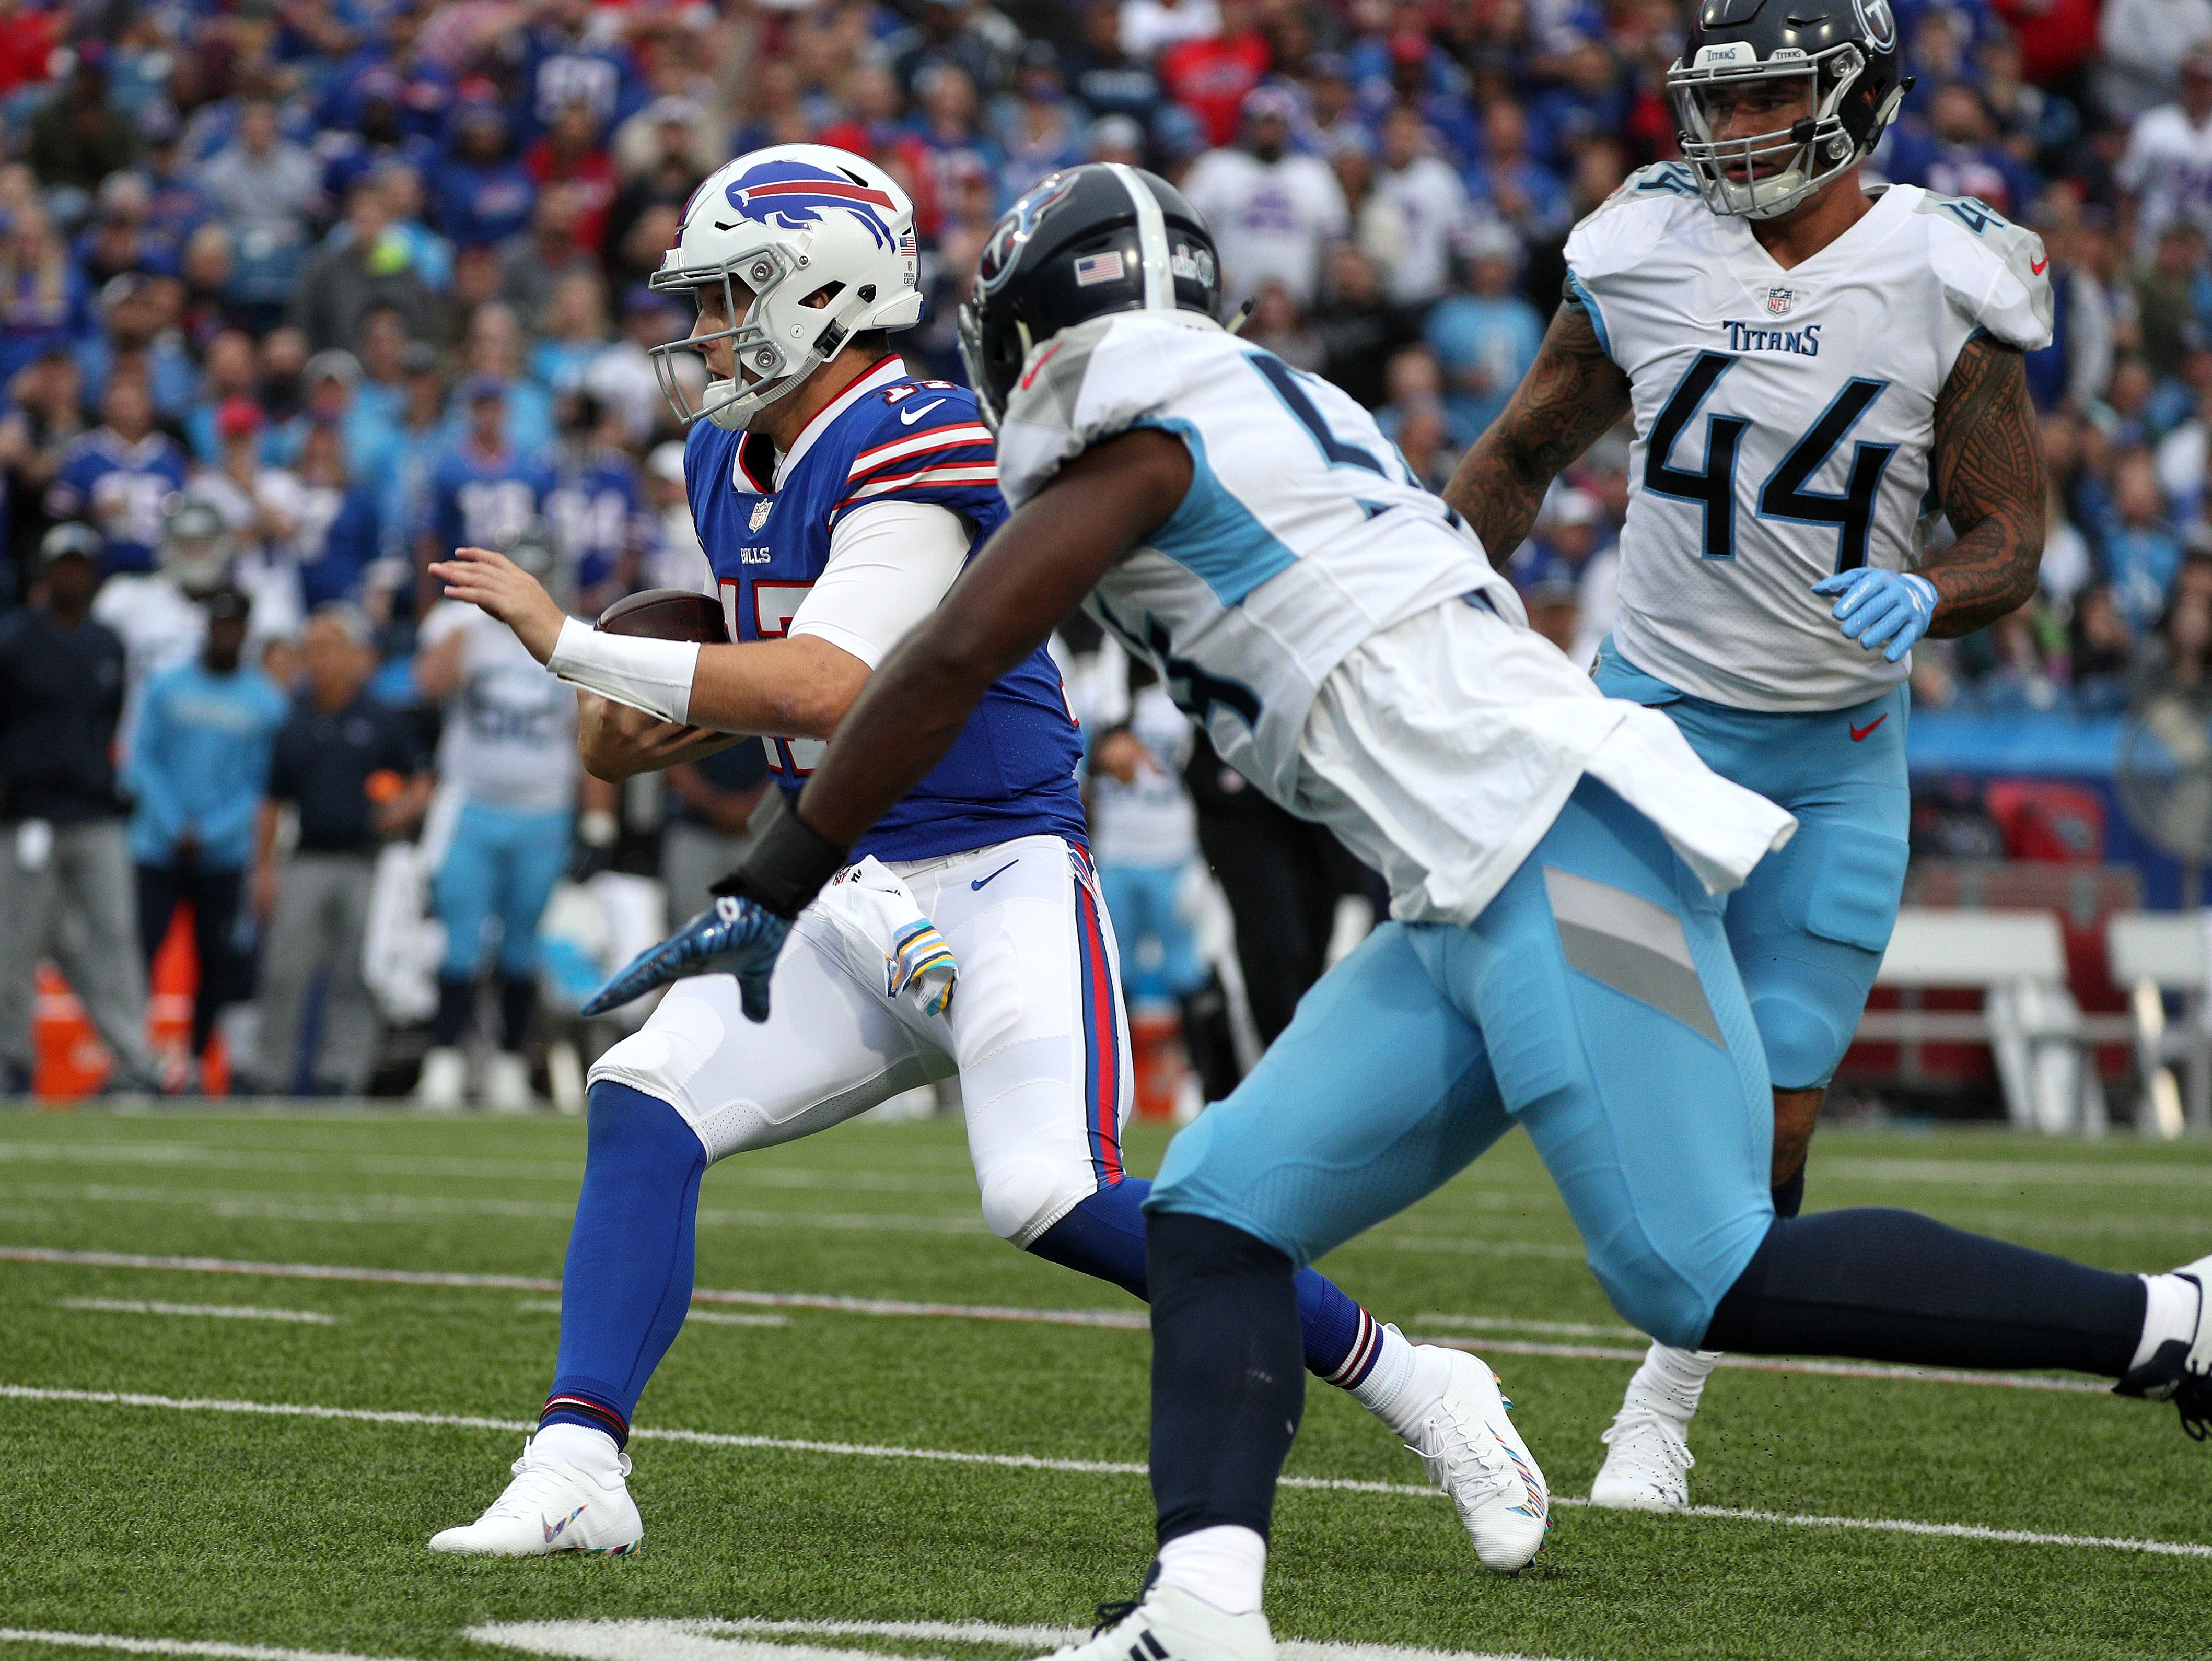 Bills uaterback Josh Allen scrambles for first quarter touchdown against the Titans.